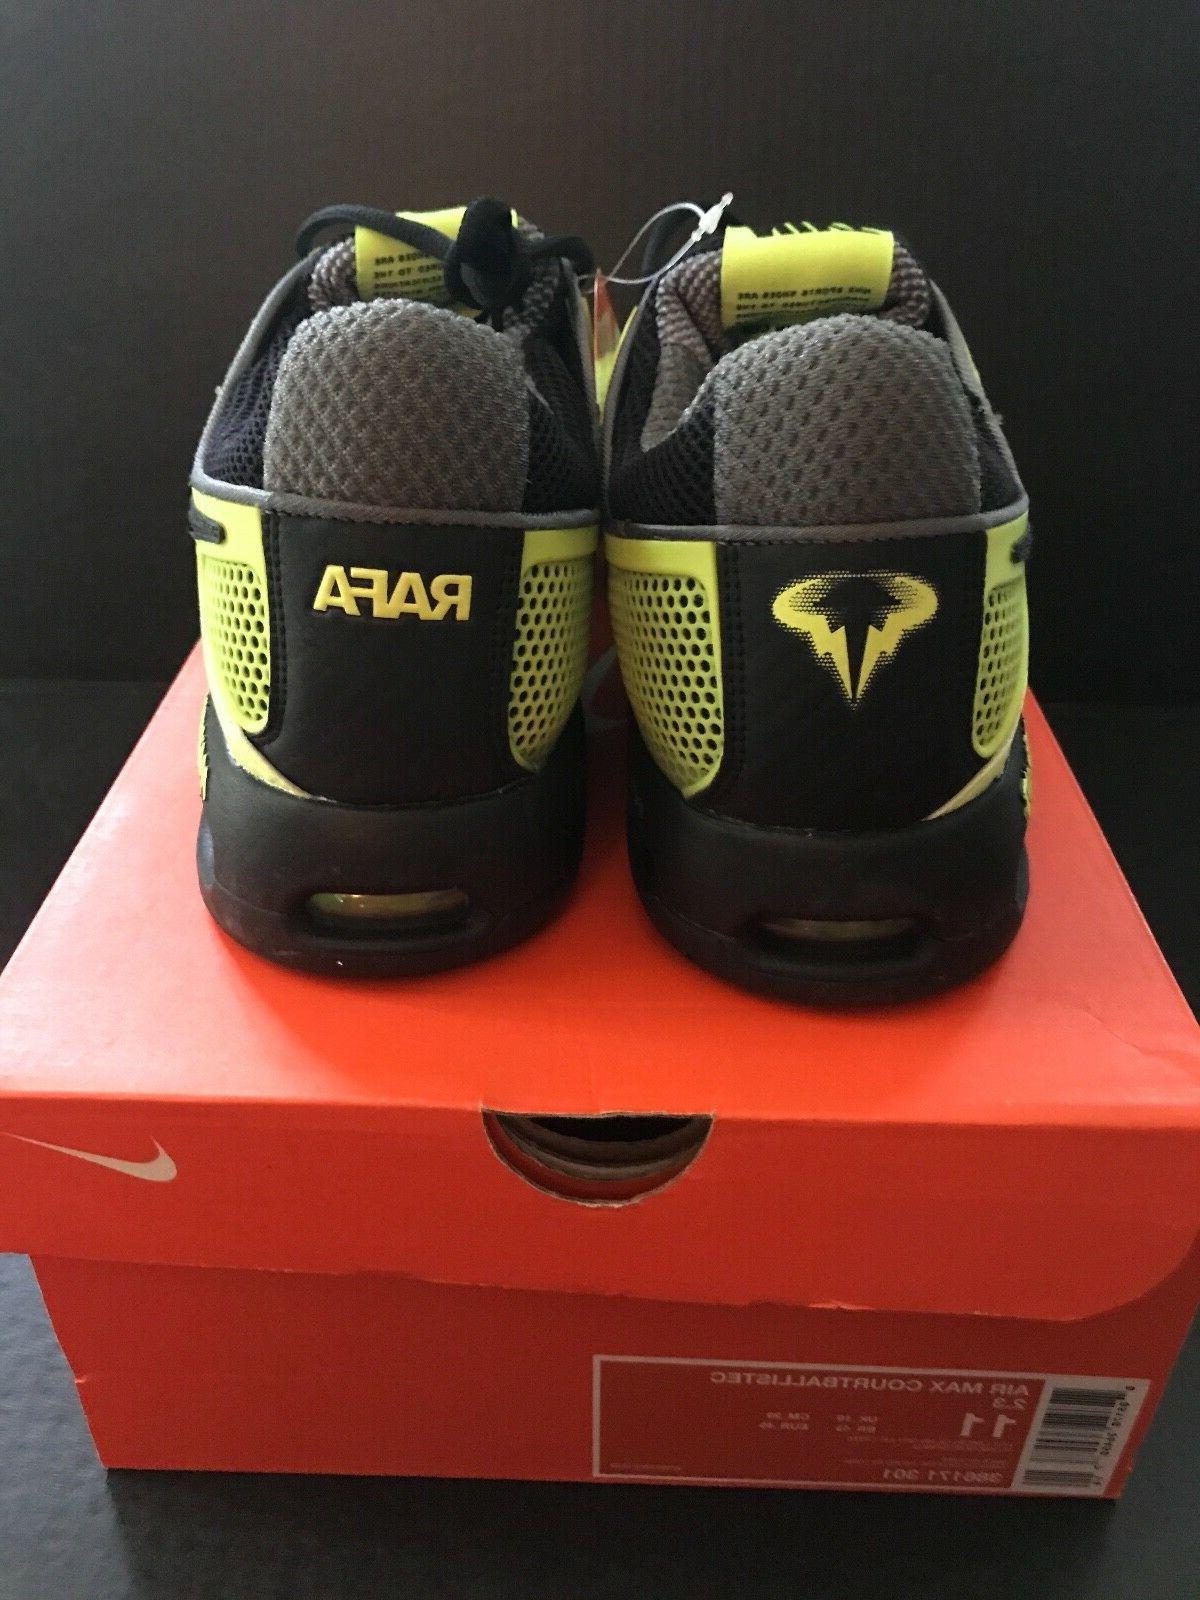 Rafa Nadal Limited Edition 2010 US Open Tennis Shoe Size 11